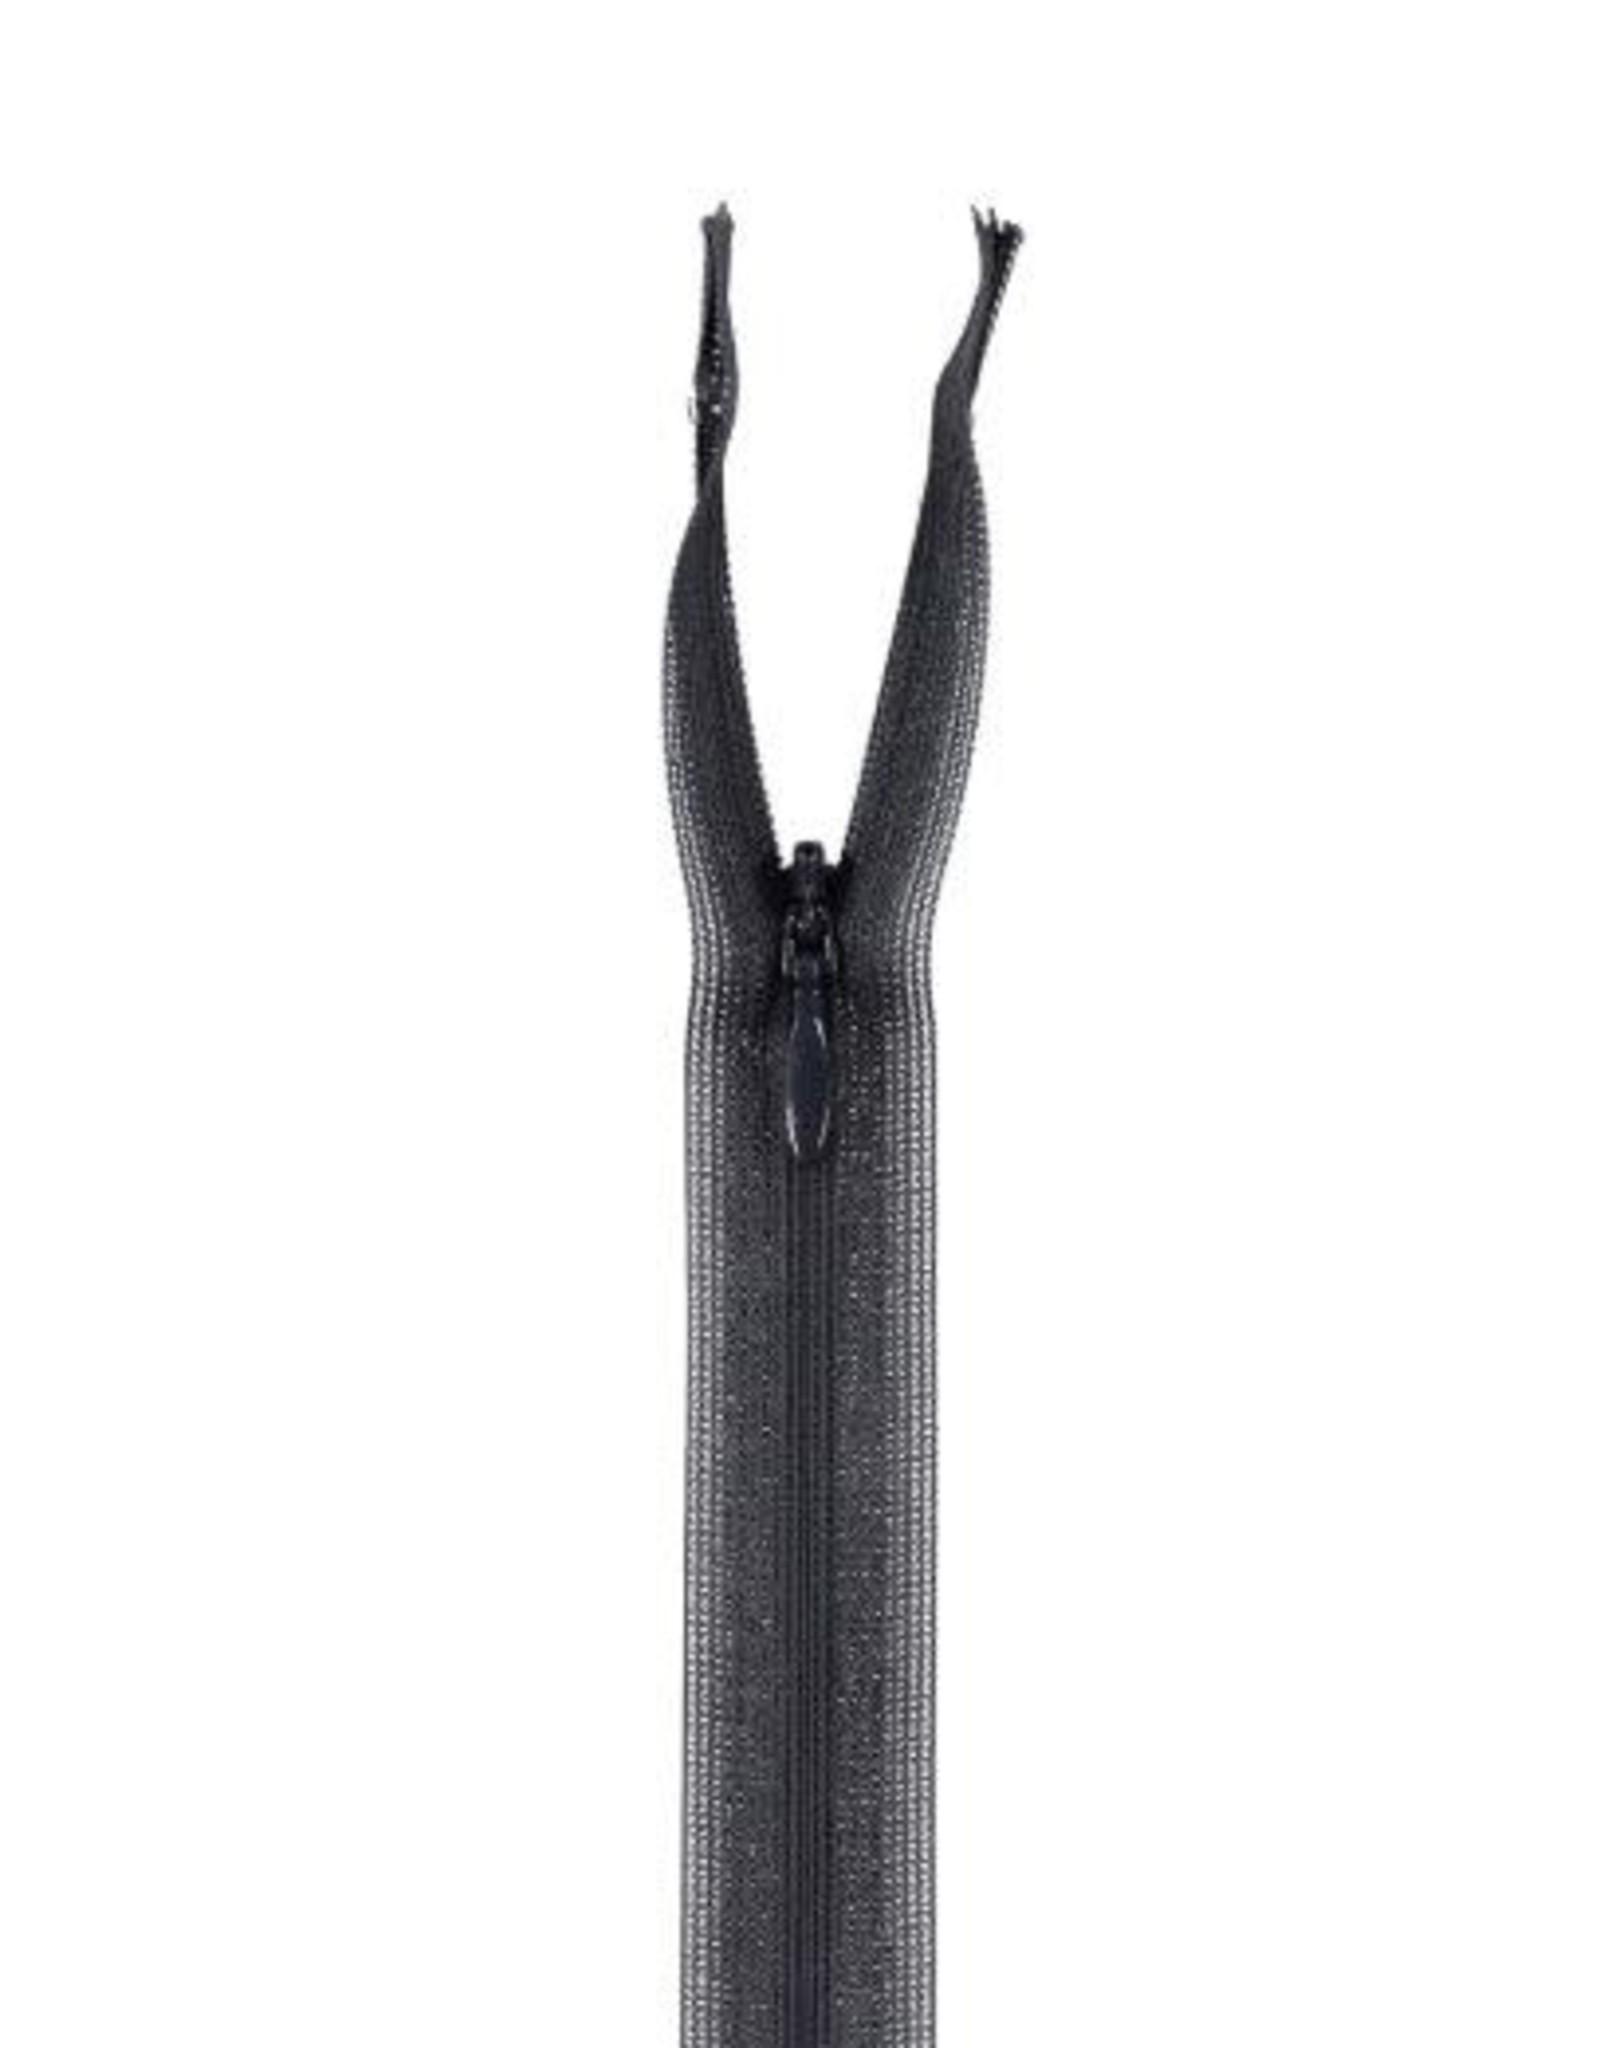 YKK NAADVERDEKTE RITS C NIET-DEELBAAR (p.1st) 71-22cm